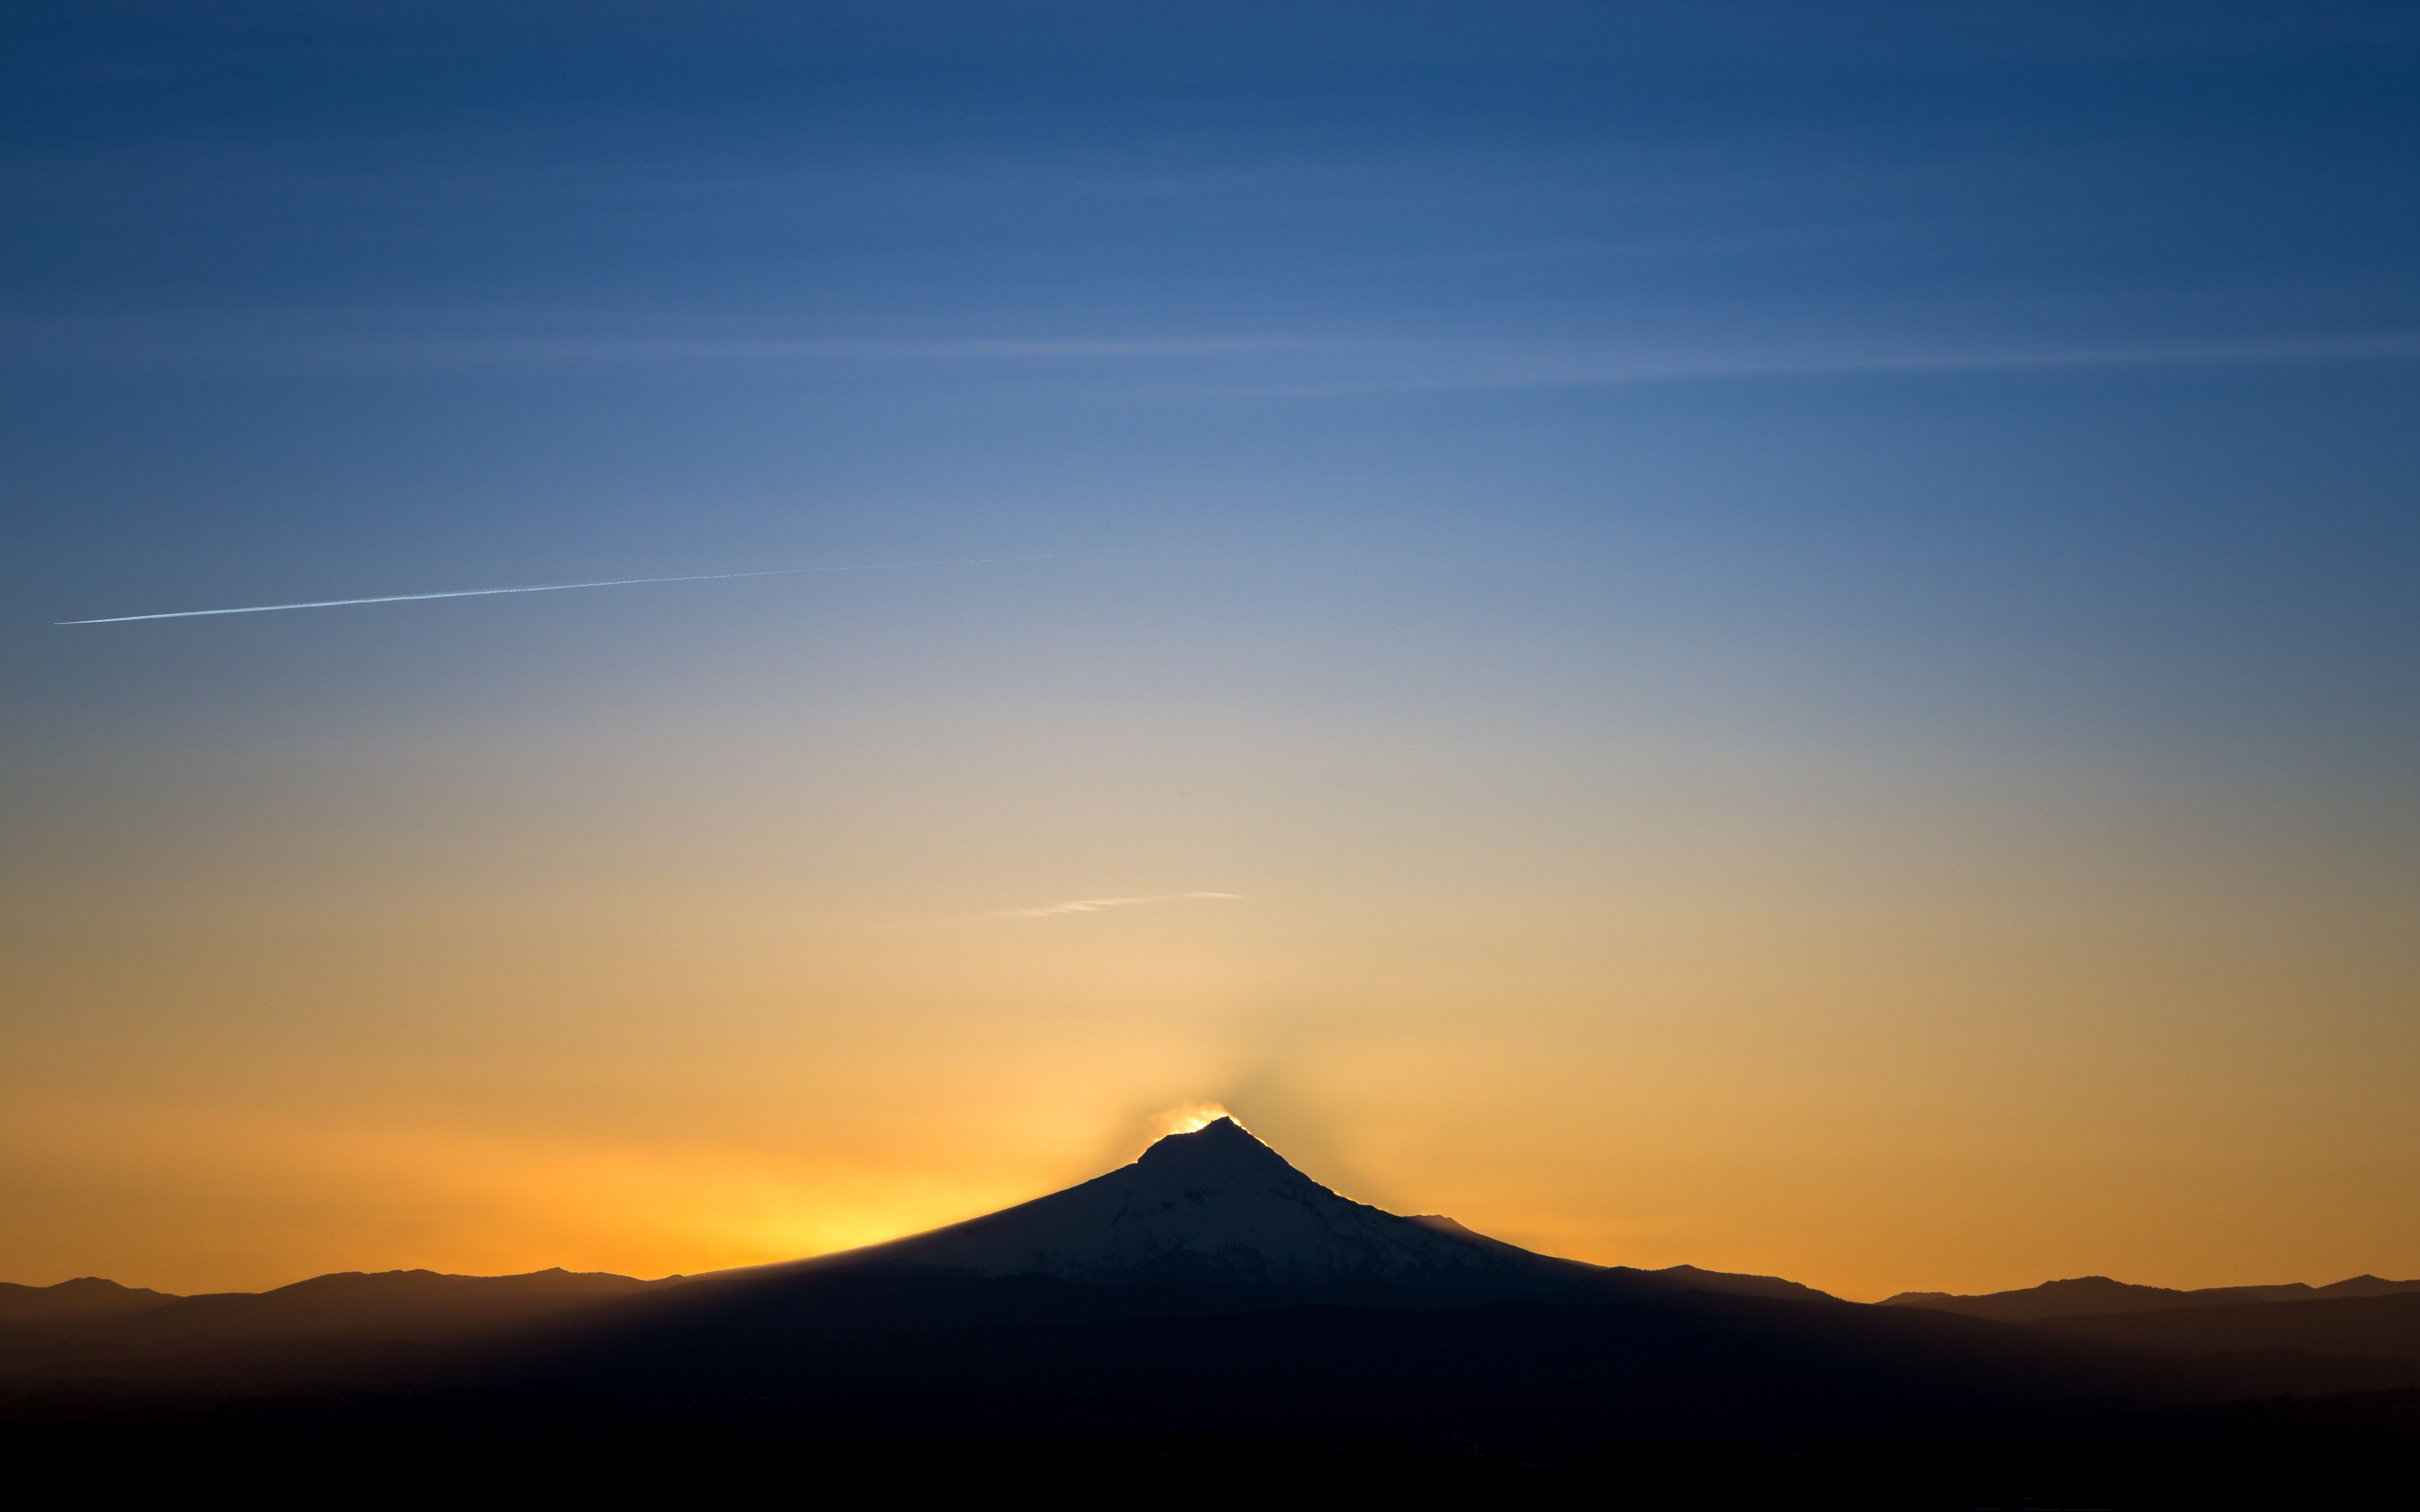 Landscape, Mountain, Sunset Wallpapers HD / Desktop And